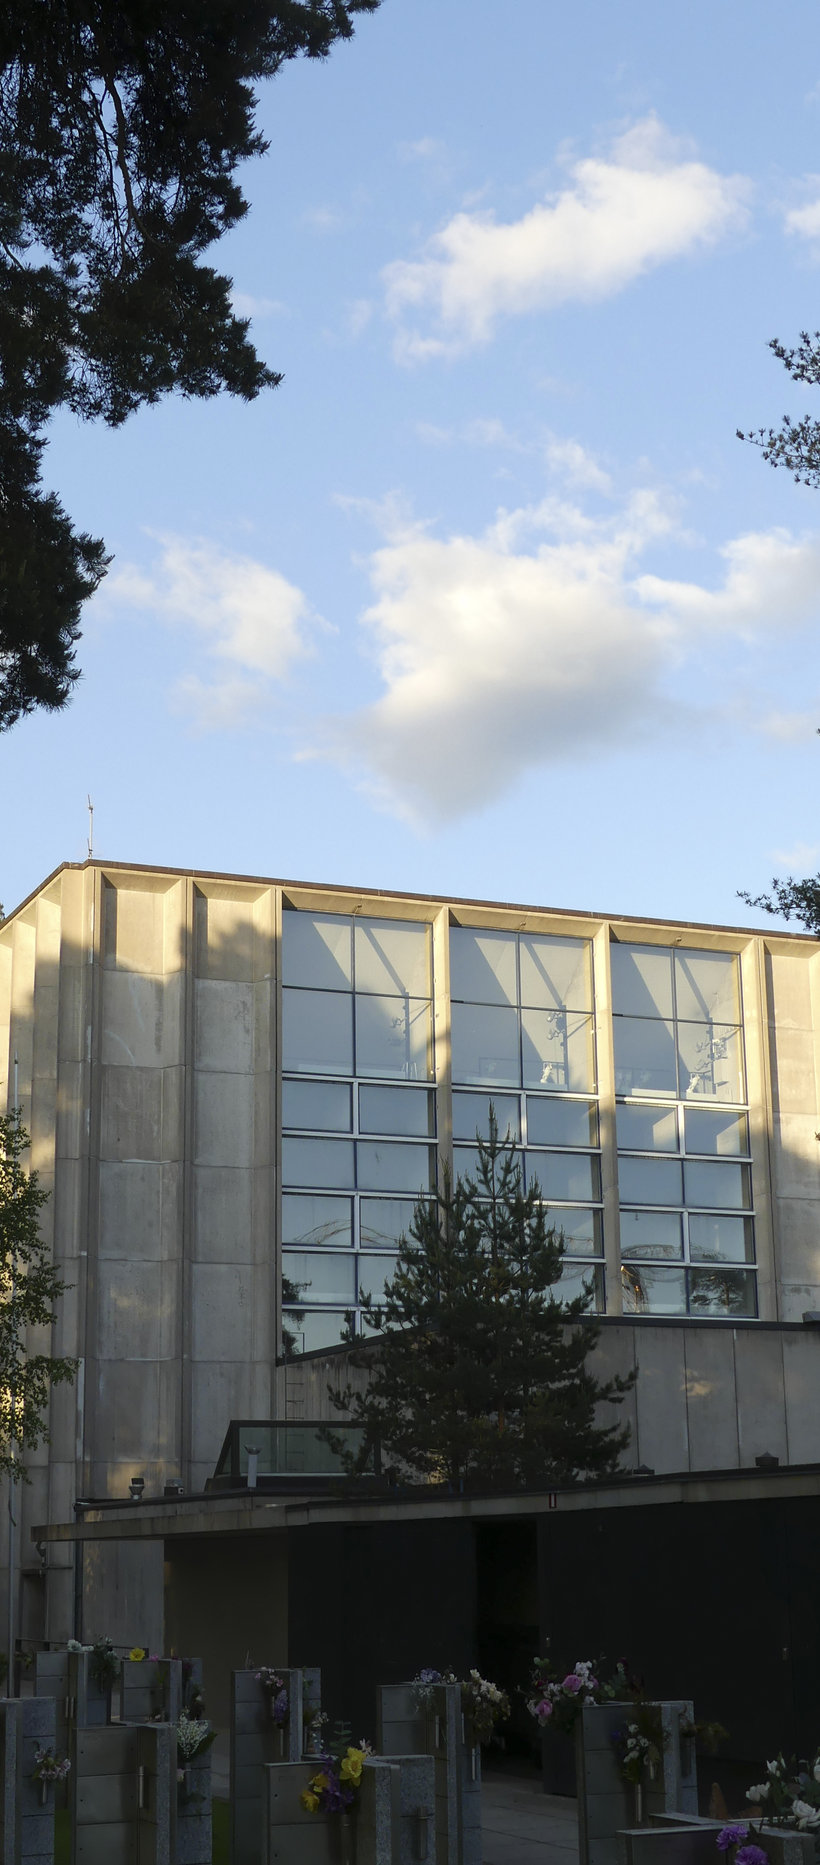 Tapiolan seurakunta - Kirkko Espoossa